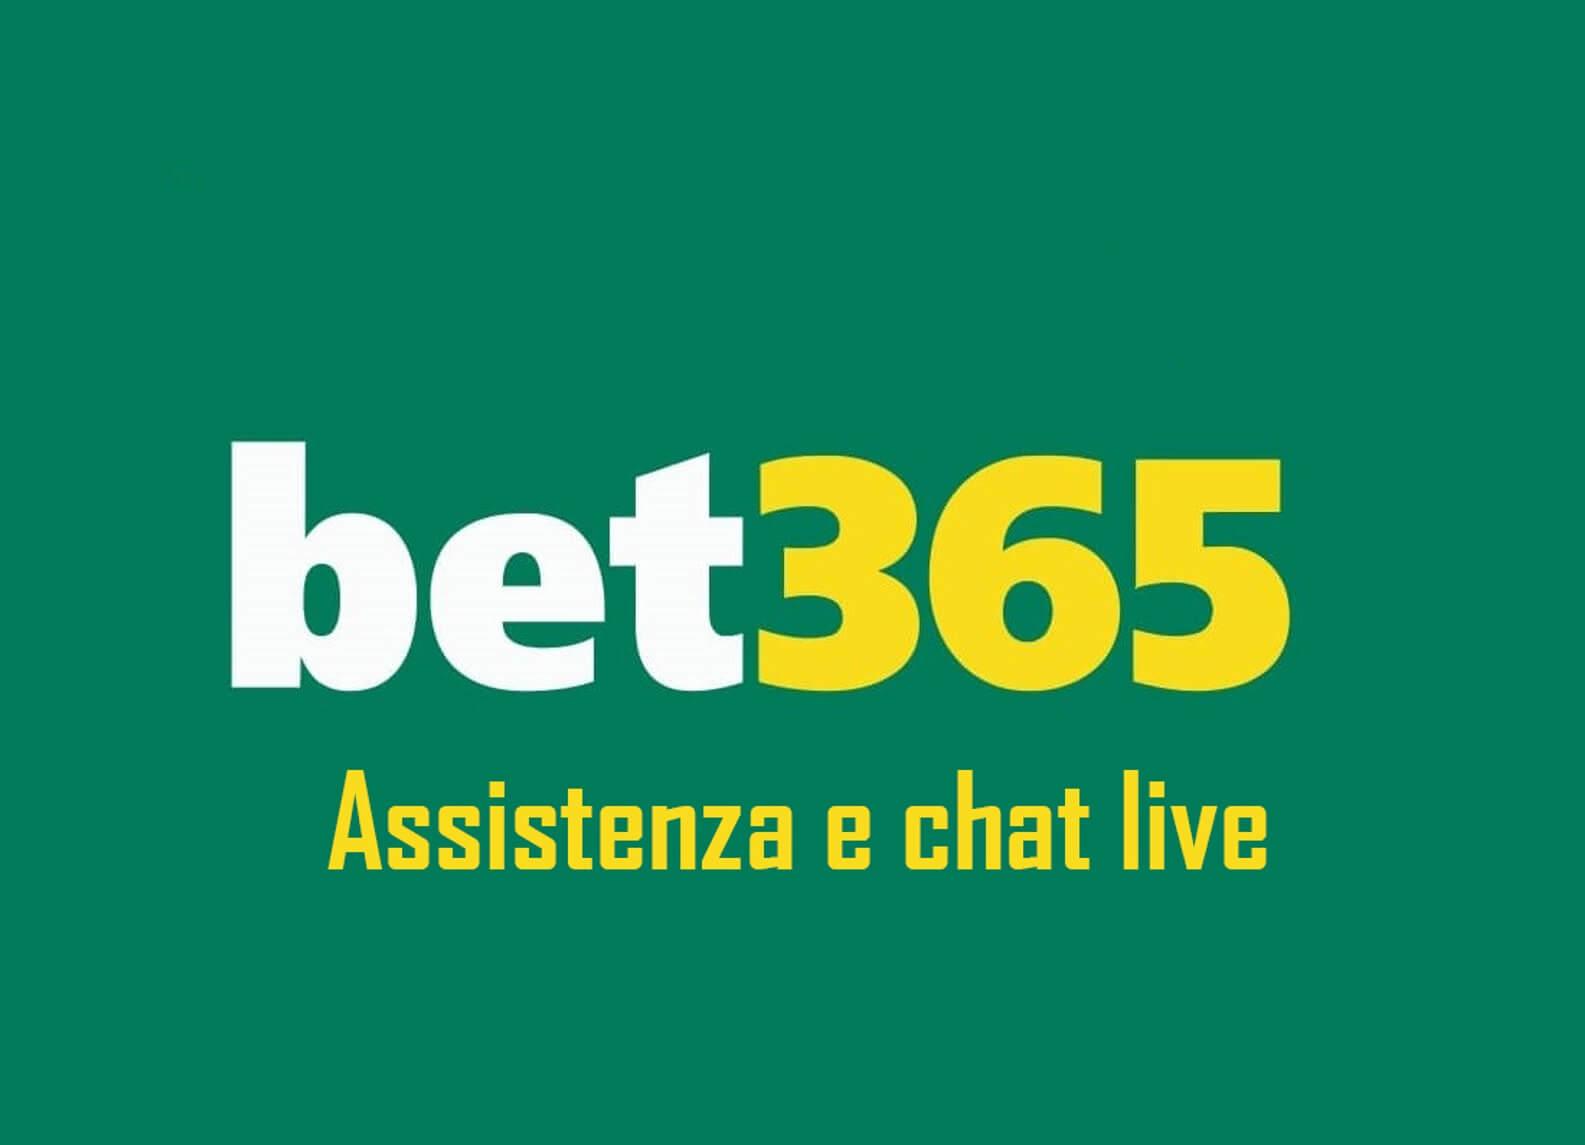 Supporto Bet365 e chat dal vivo